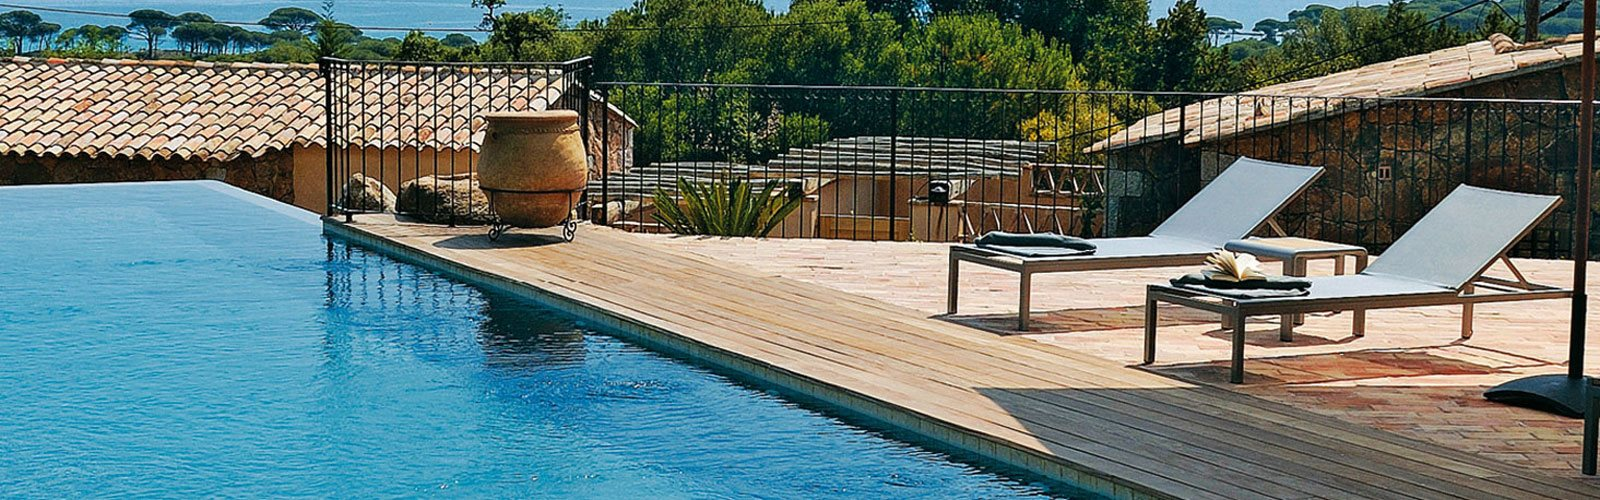 Hotels Auf Korsika Grosse Auswahl Beim Korsika Spezialist